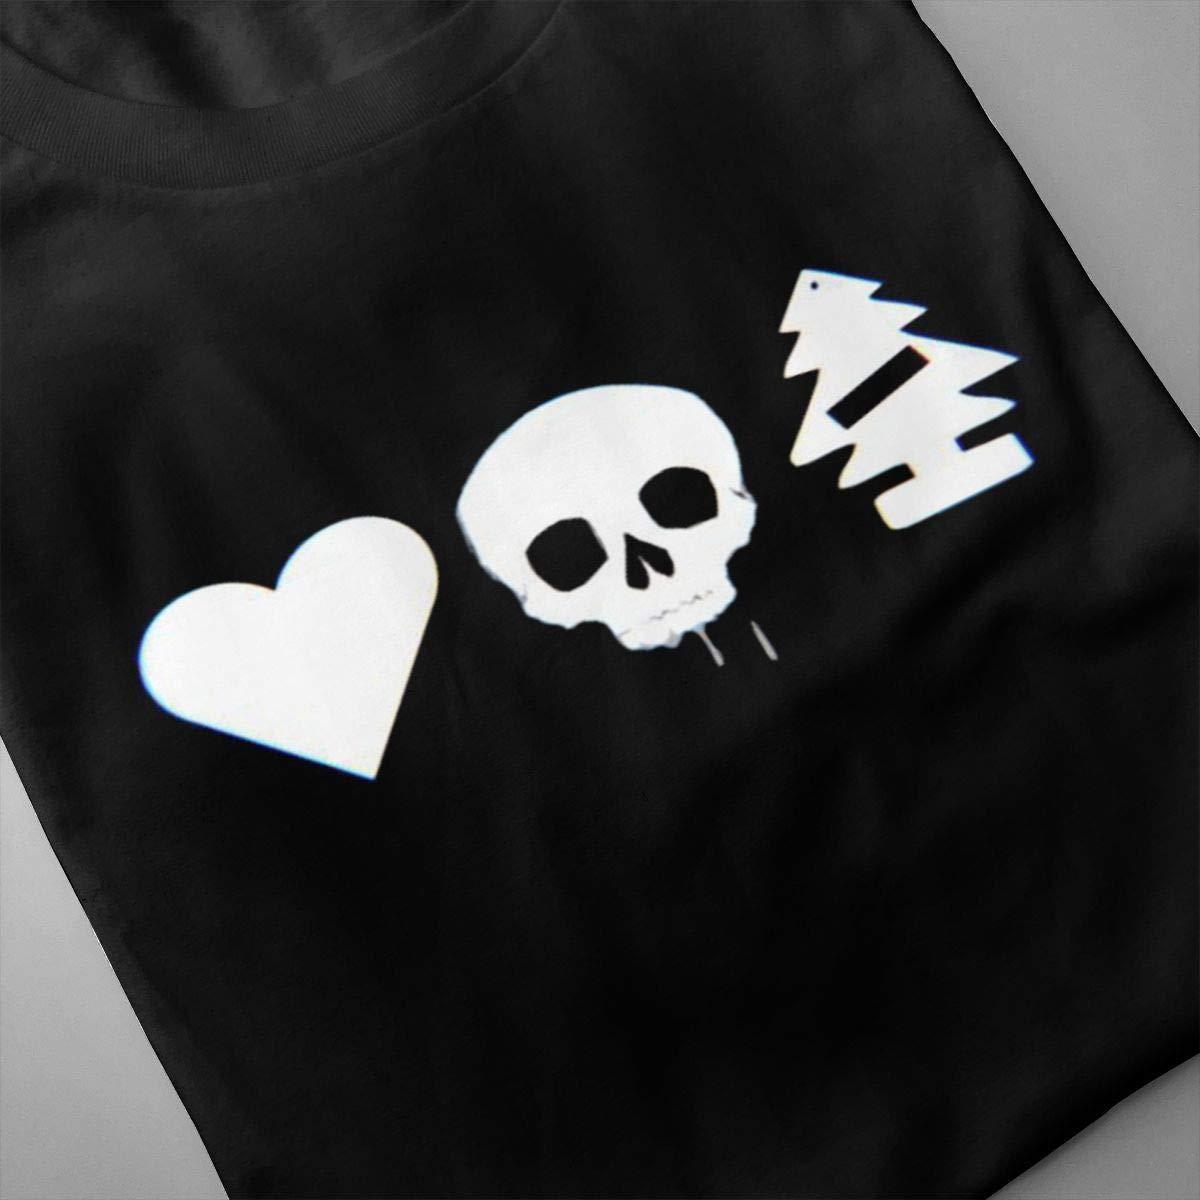 SHENGN Mens Print Casual Helping Hand Love Death Robots Logo Short Sleeve New T-Shirts Black